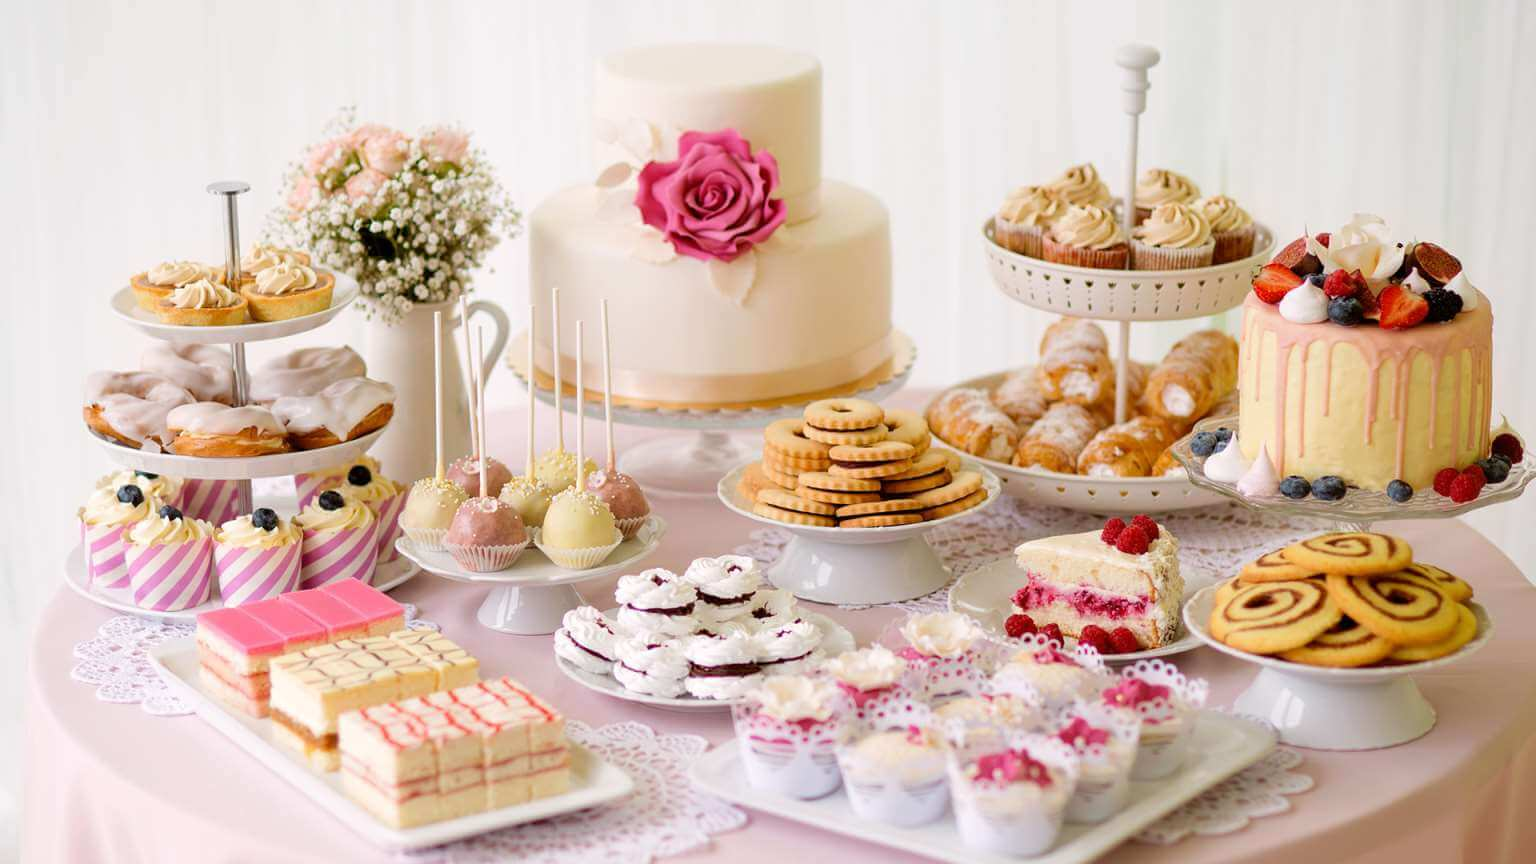 5410302-Производство на сладкарски изделия